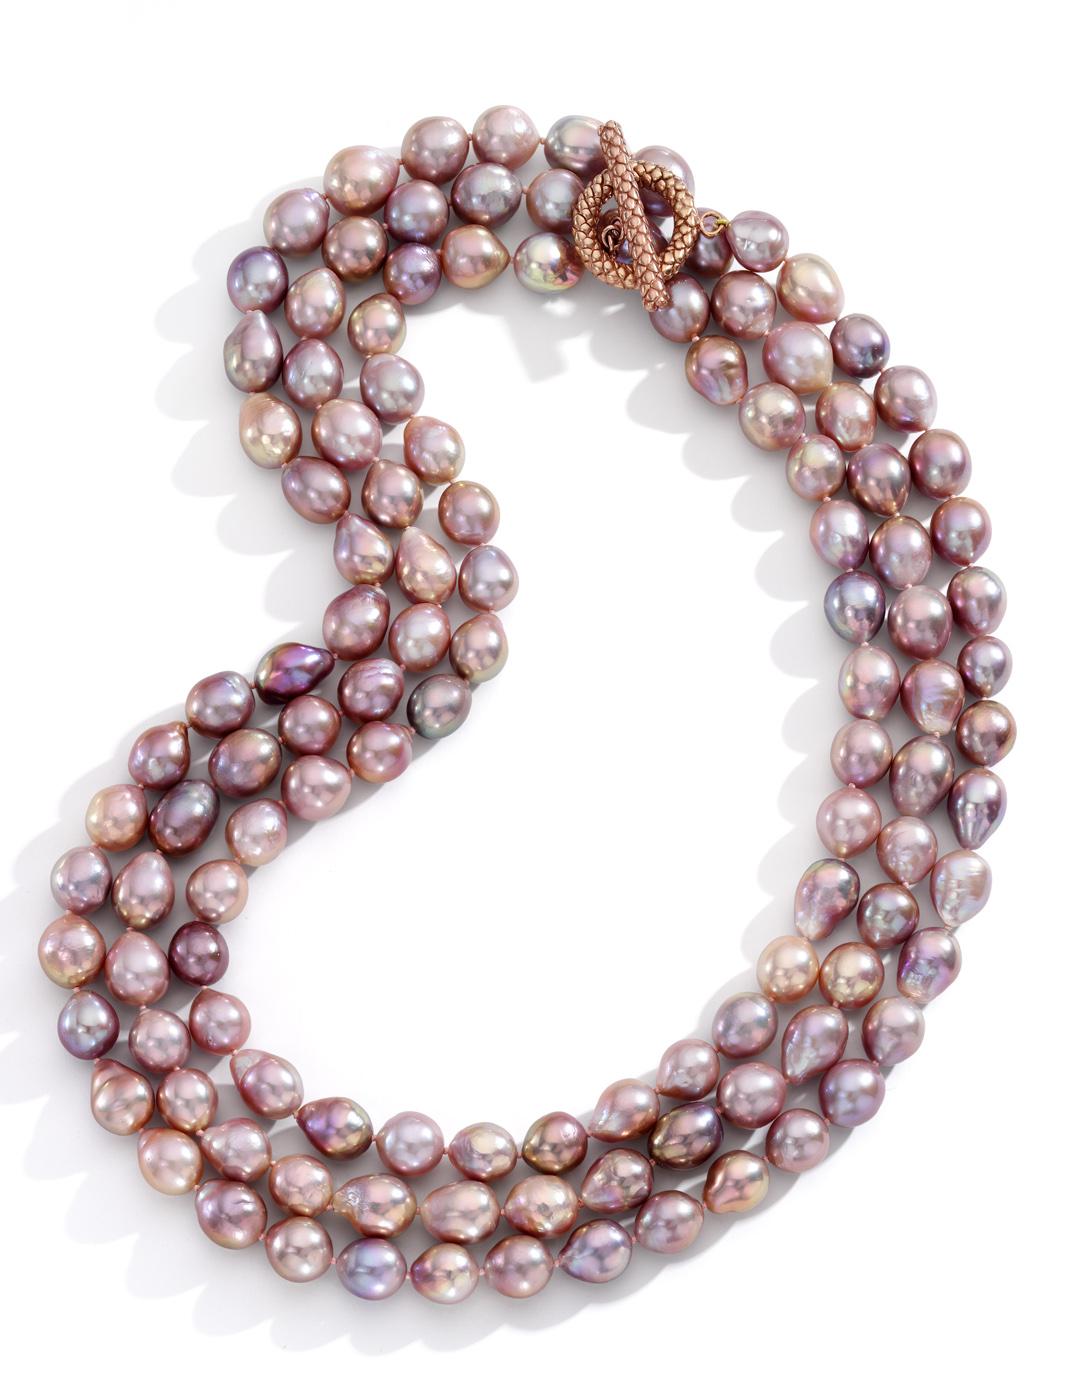 mish_necklaces_Pink Pearl-Fireleaf-NK-1